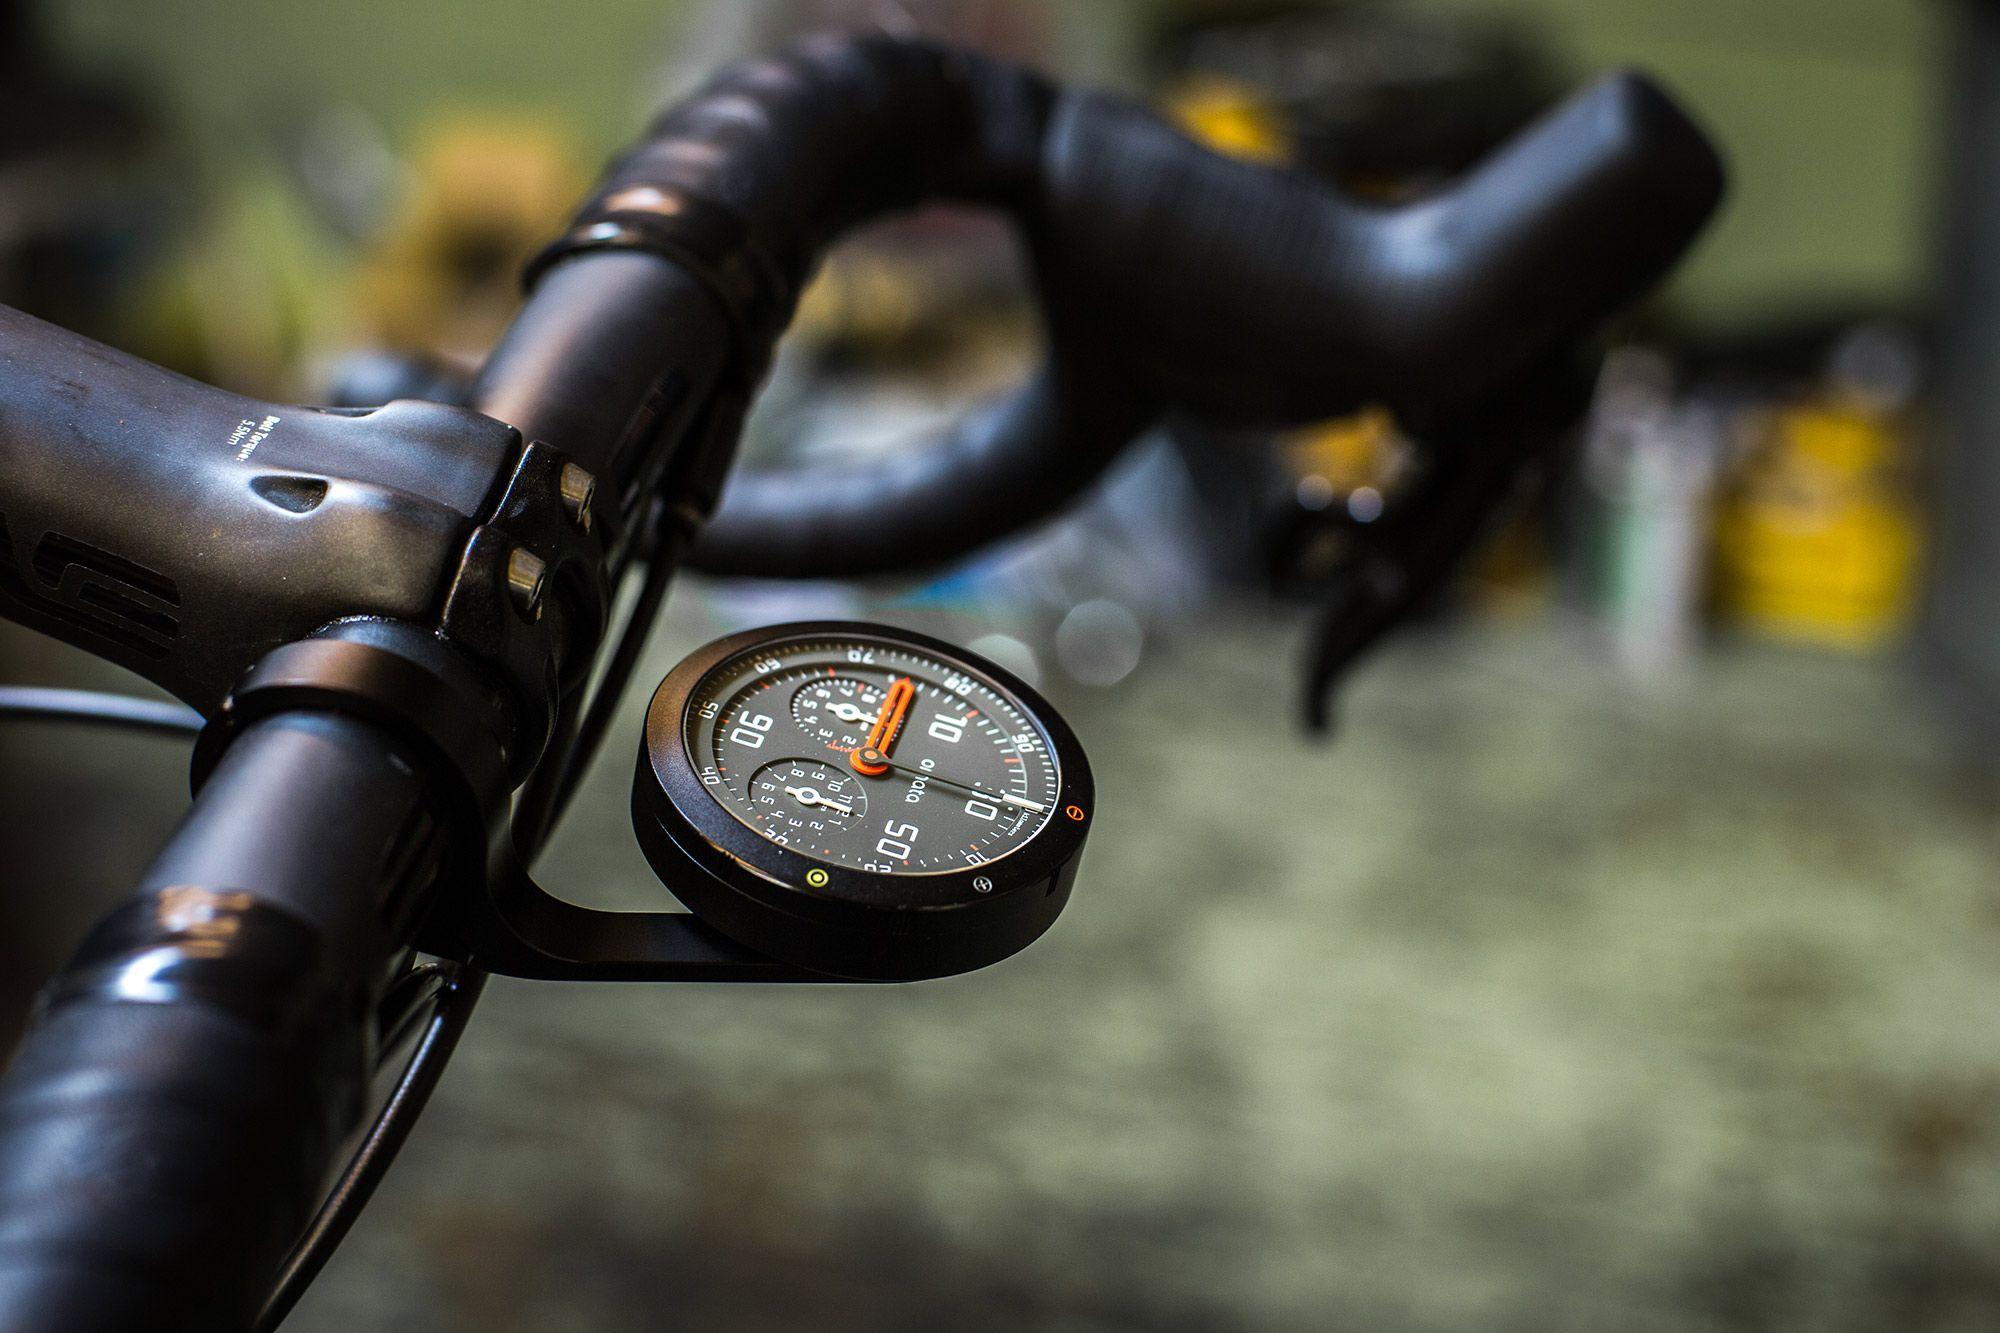 Omata One Analog Speedometer Cool Bike Accessories Bike